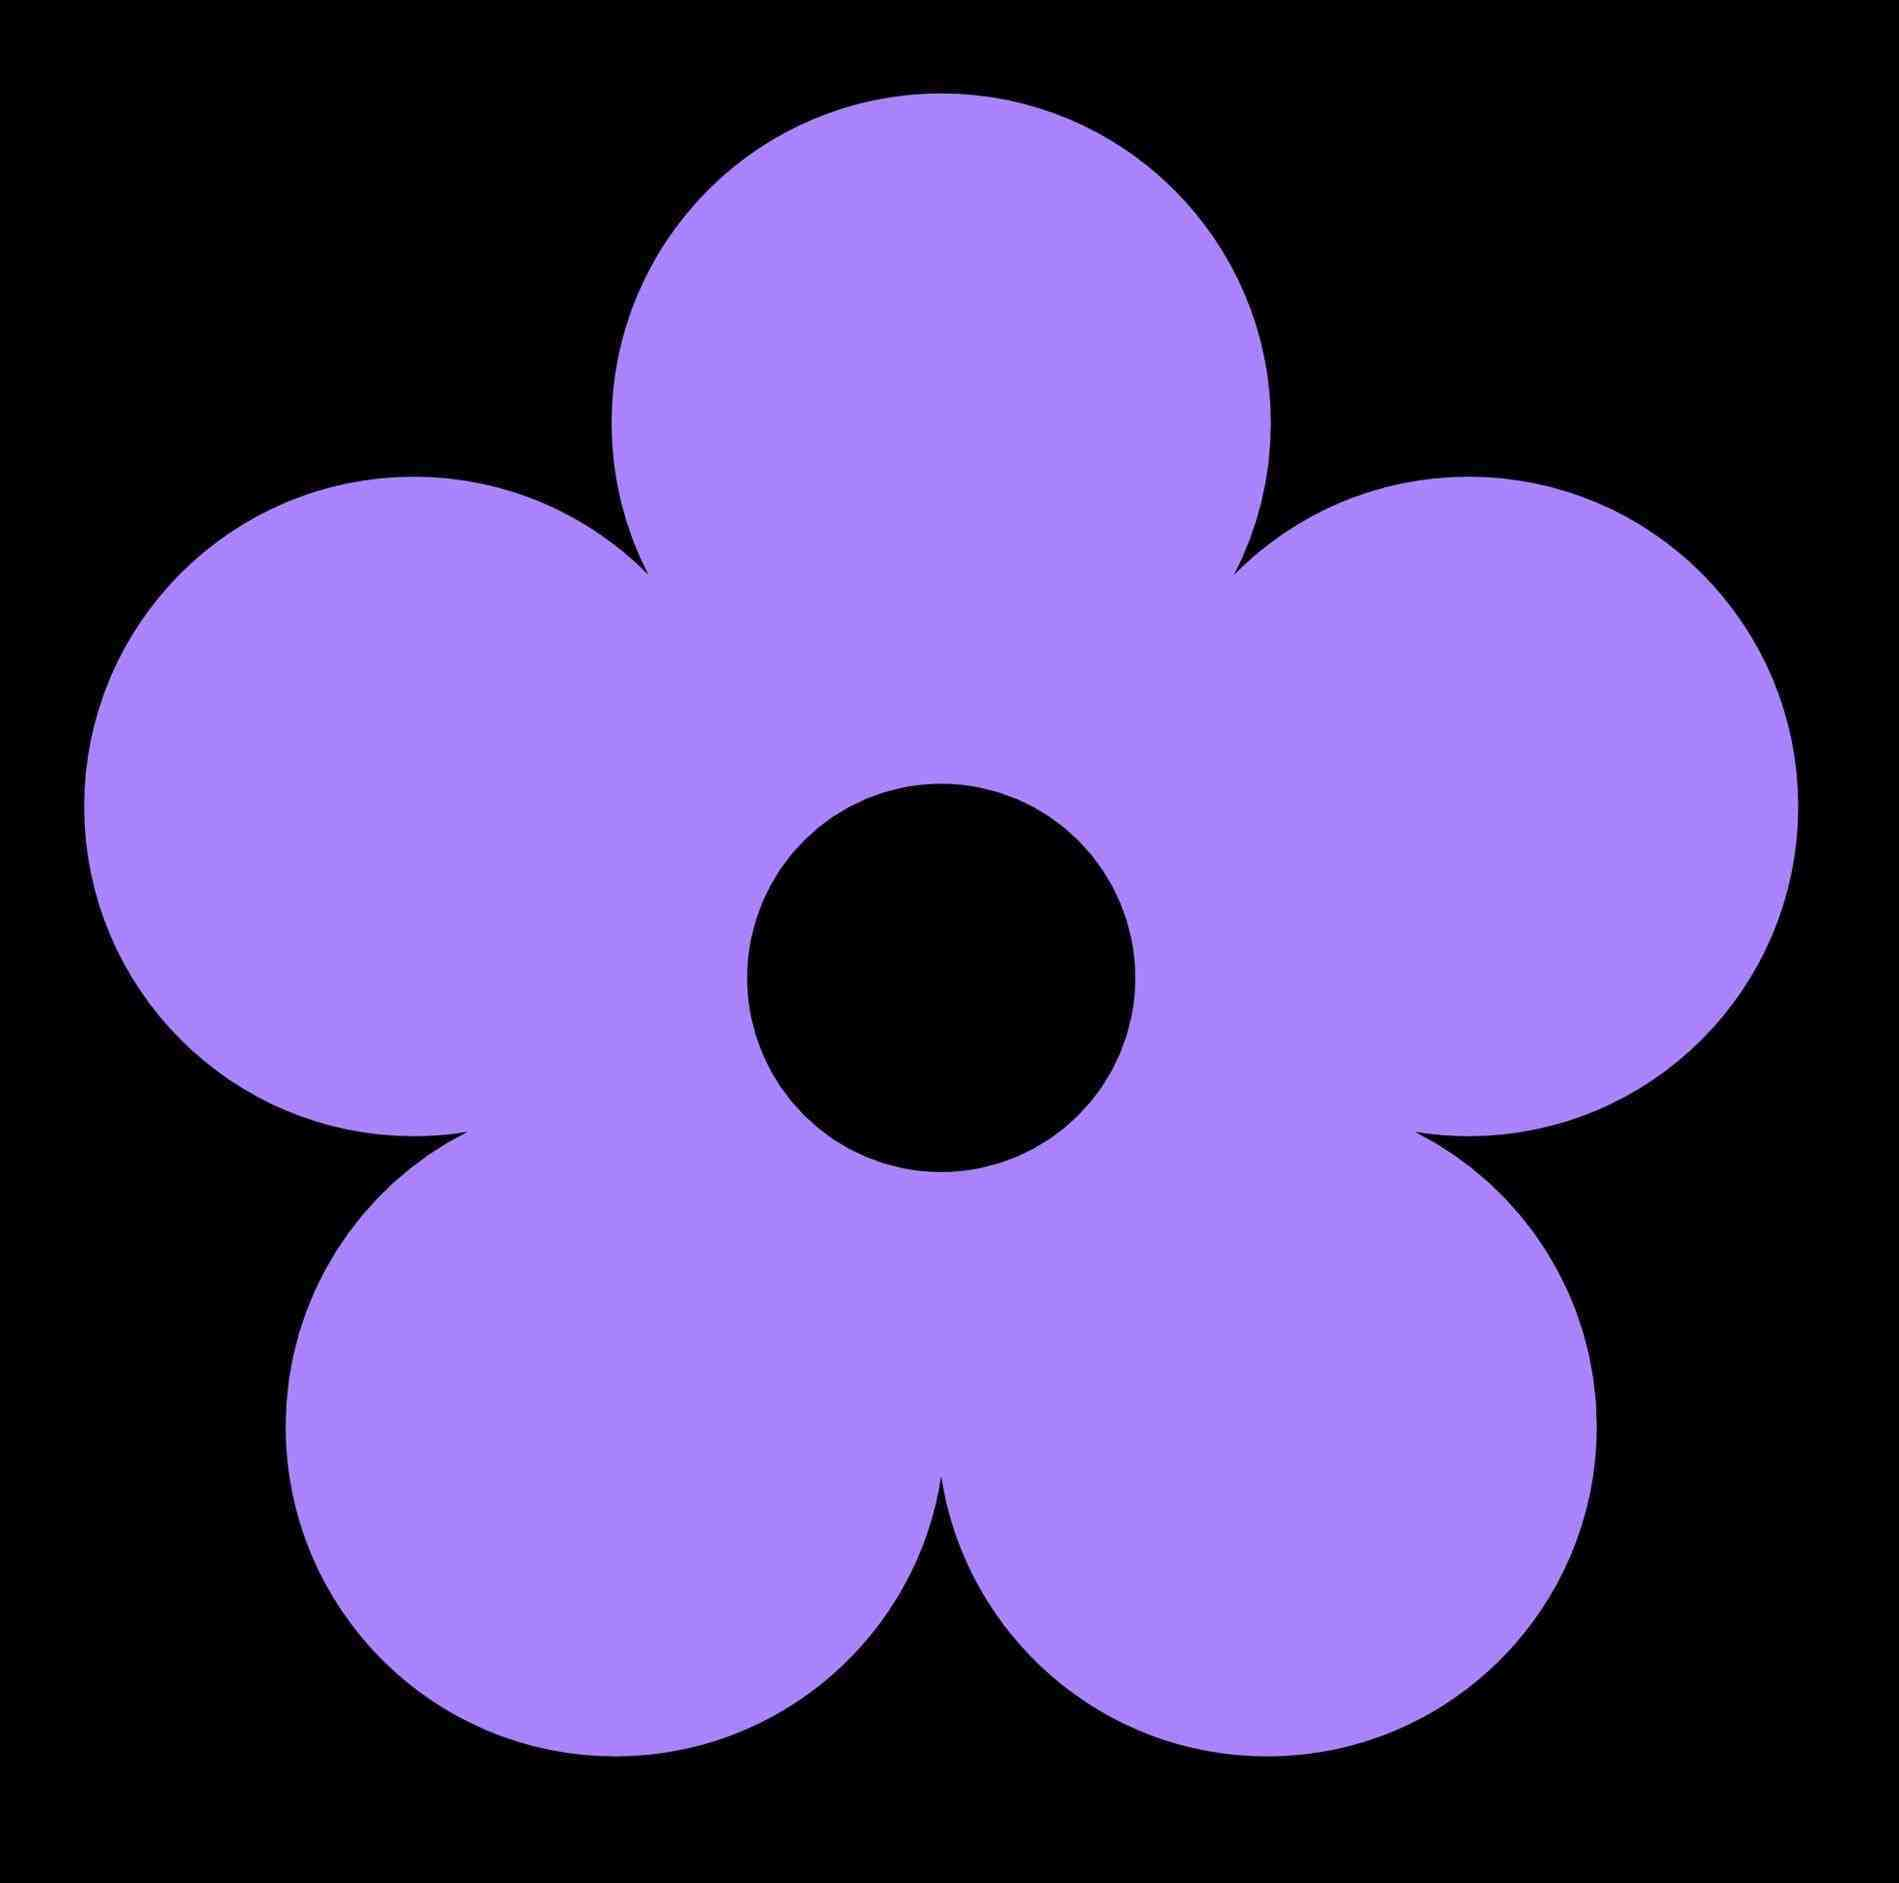 1899x1883 Purple Star Border Clipartrhworldartsmecom Borders And Frames Clip